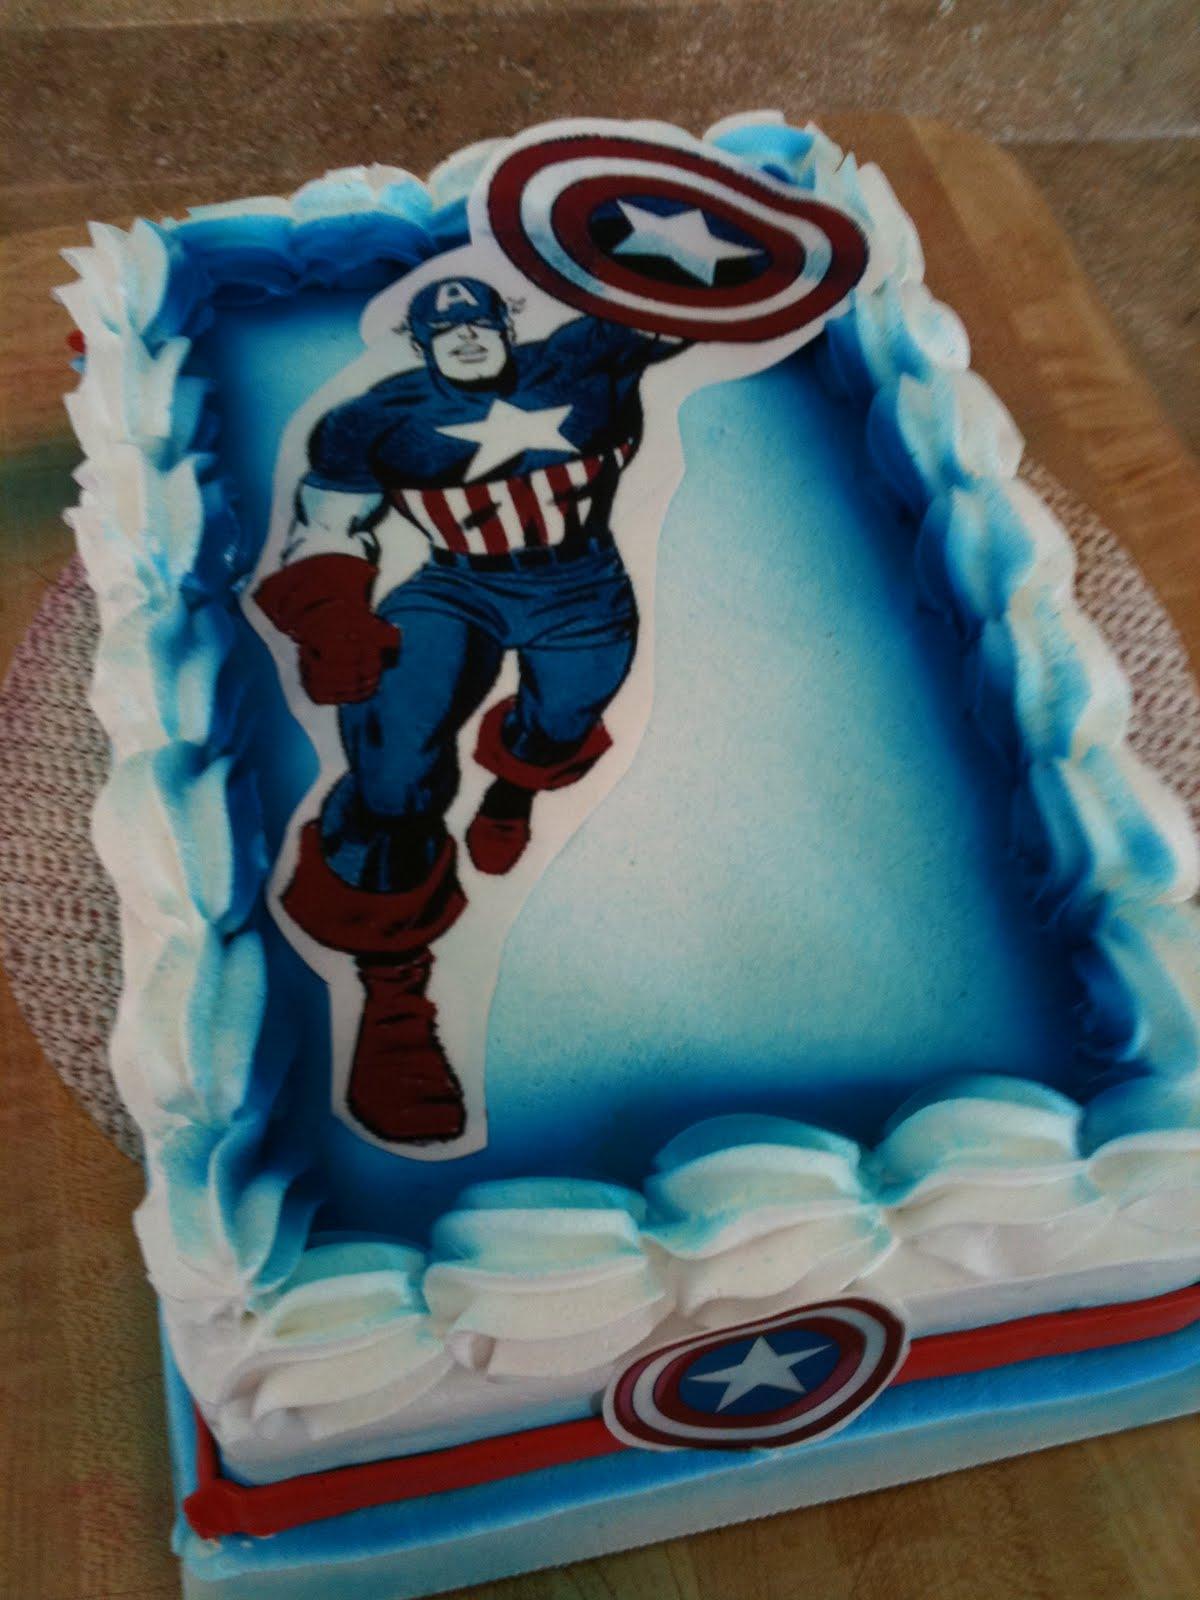 Admirable Captain America Cakes Decoration Ideas Little Birthday Cakes Funny Birthday Cards Online Alyptdamsfinfo